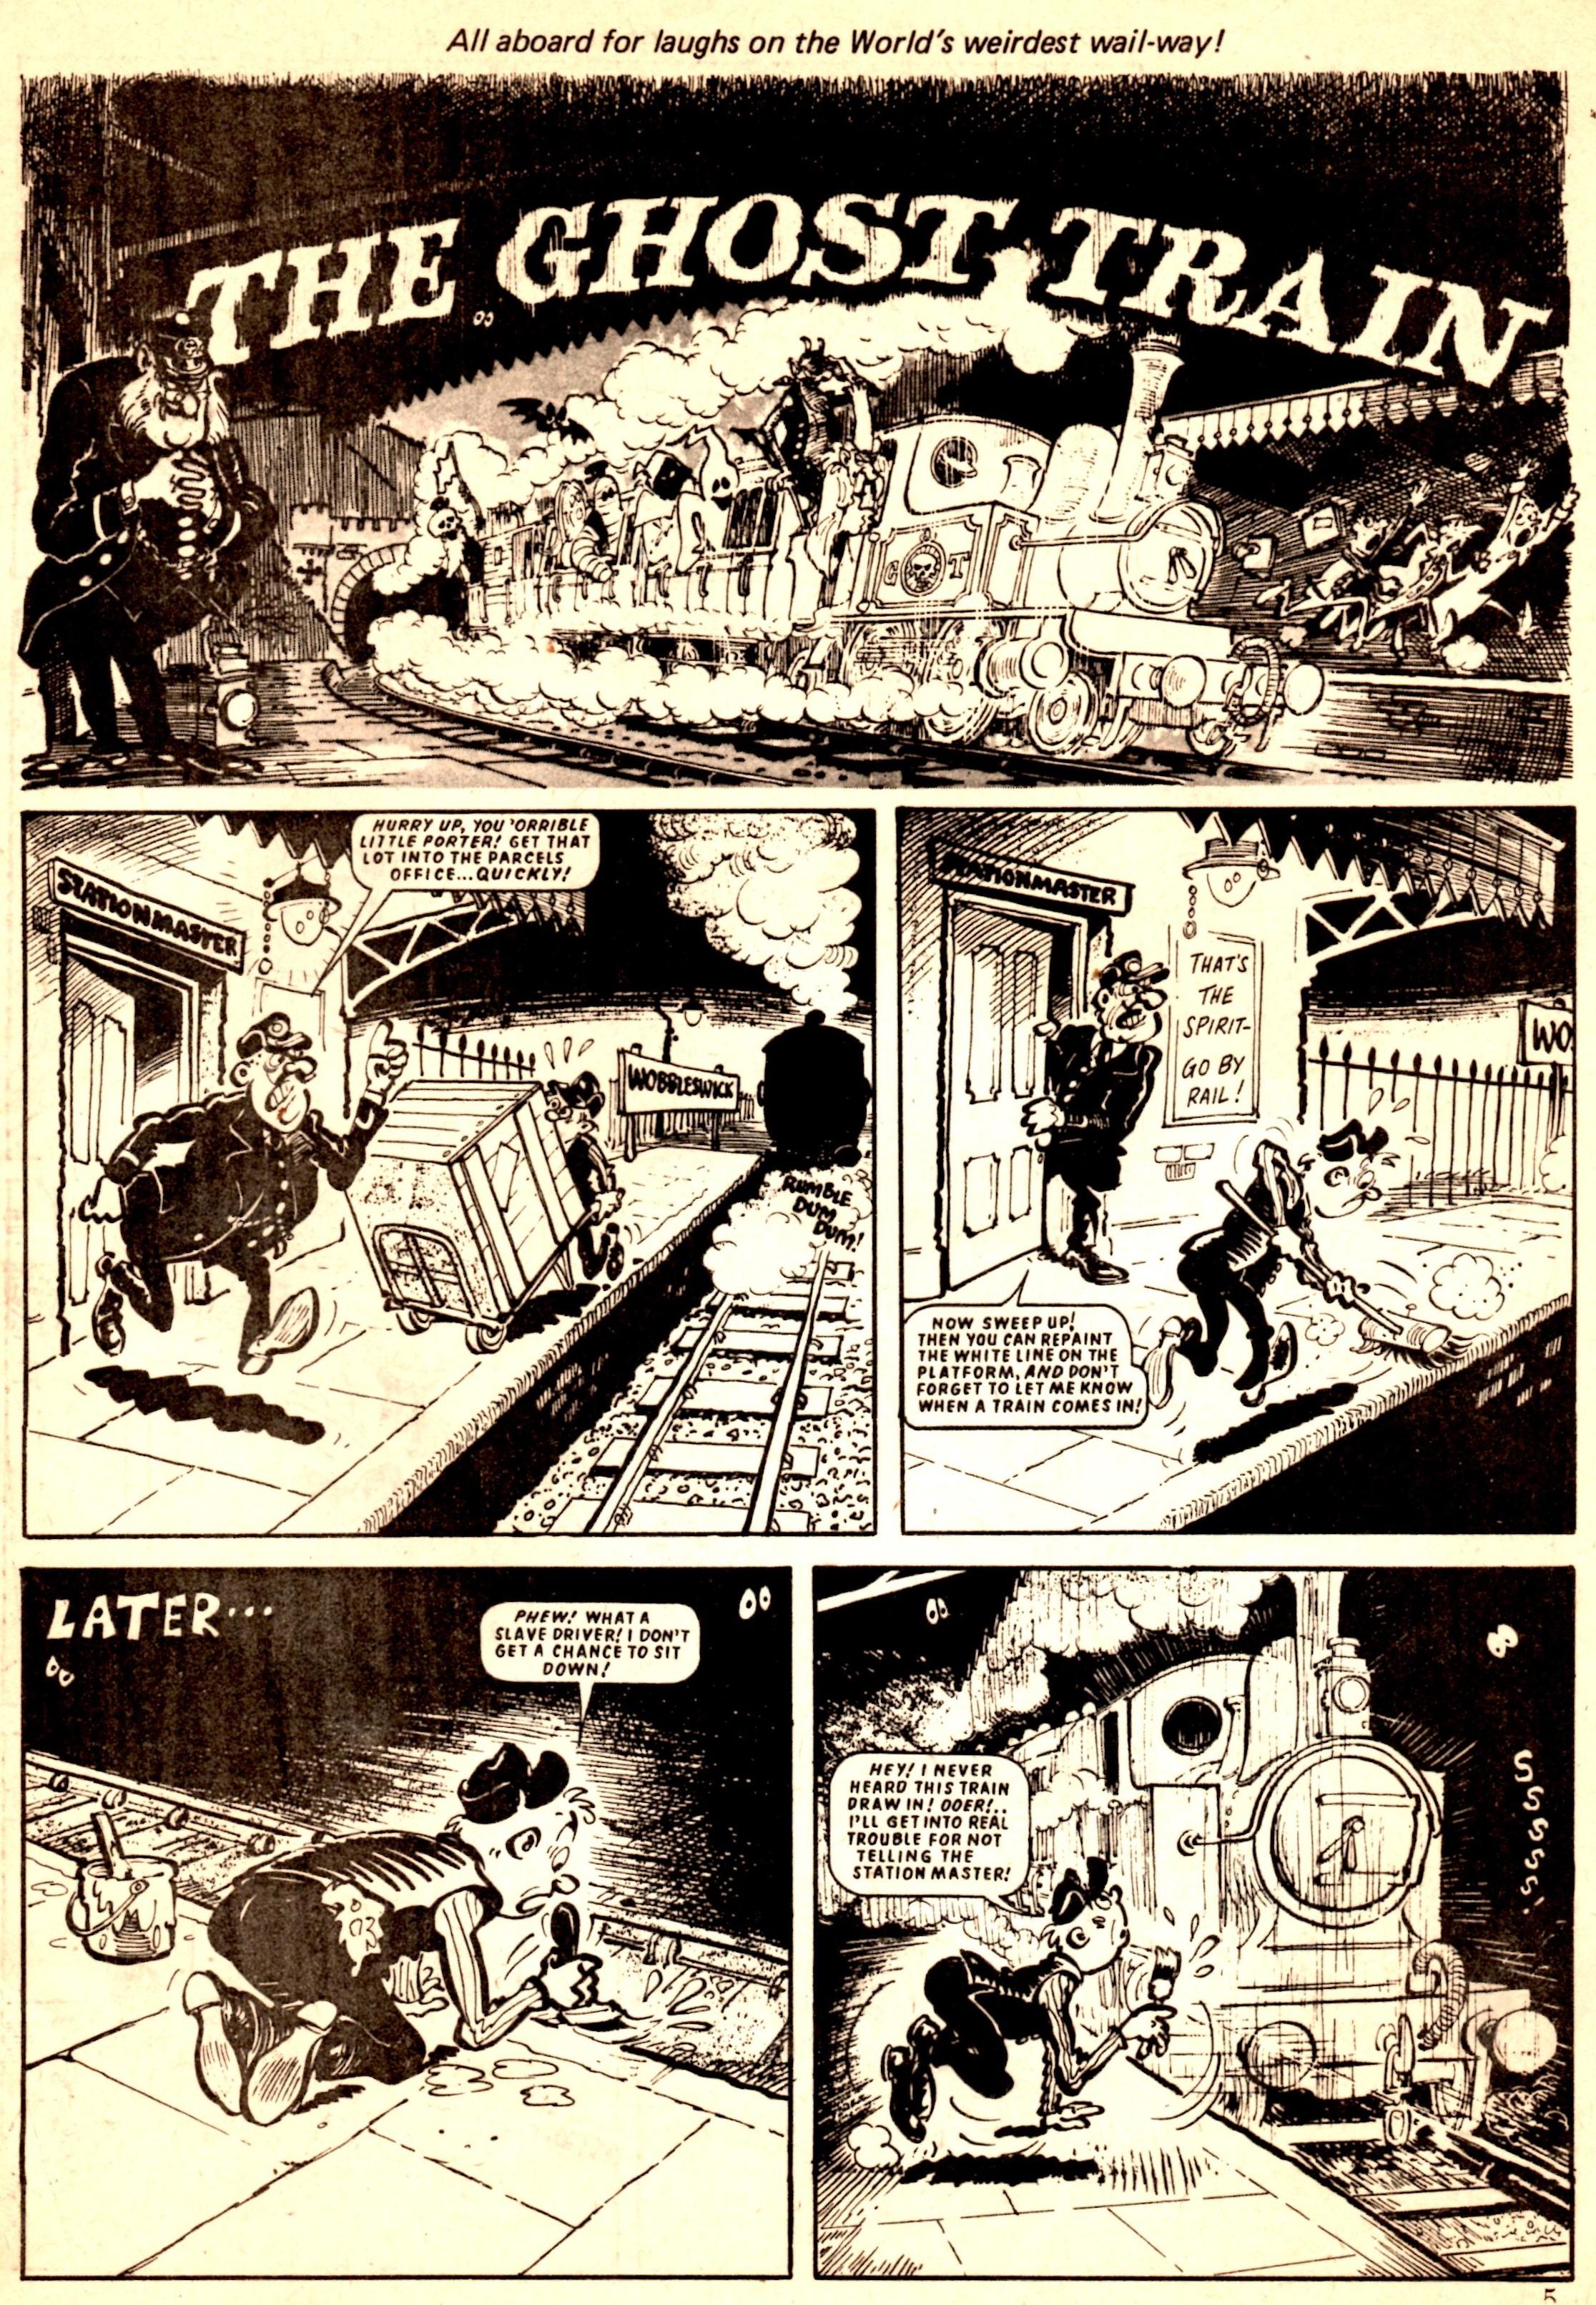 The Ghost Train: Brian Walker (artist)